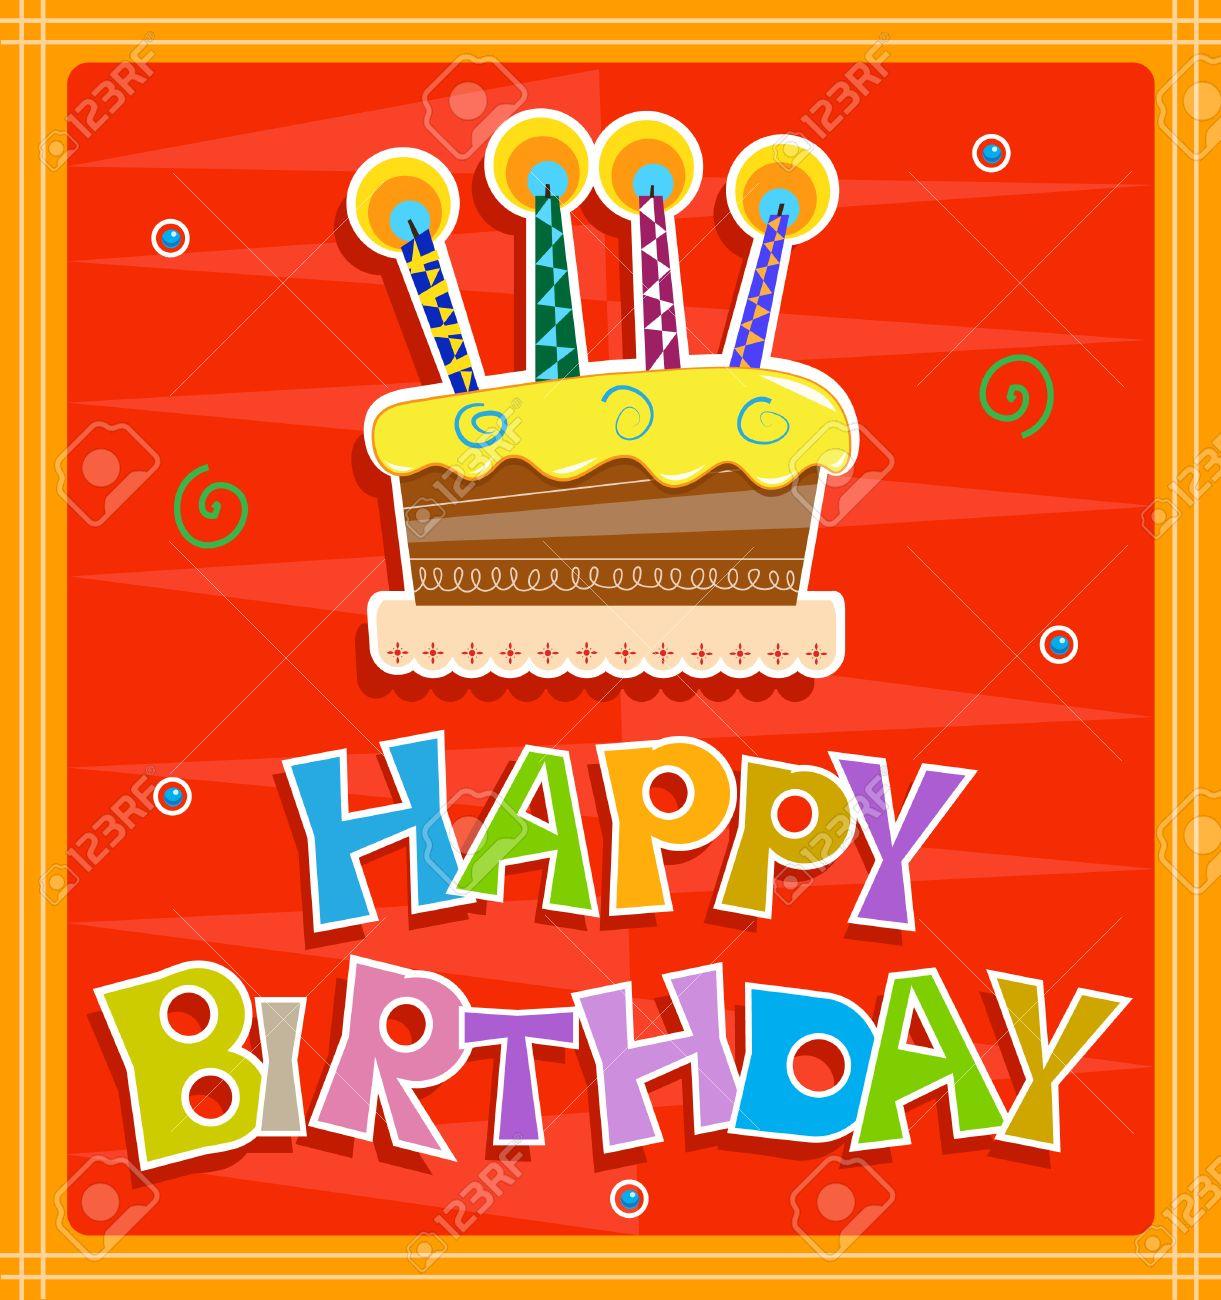 Happy Birthday Card Cheerful Birthday Greeting Card Design – Latest Birthday Cards Designs